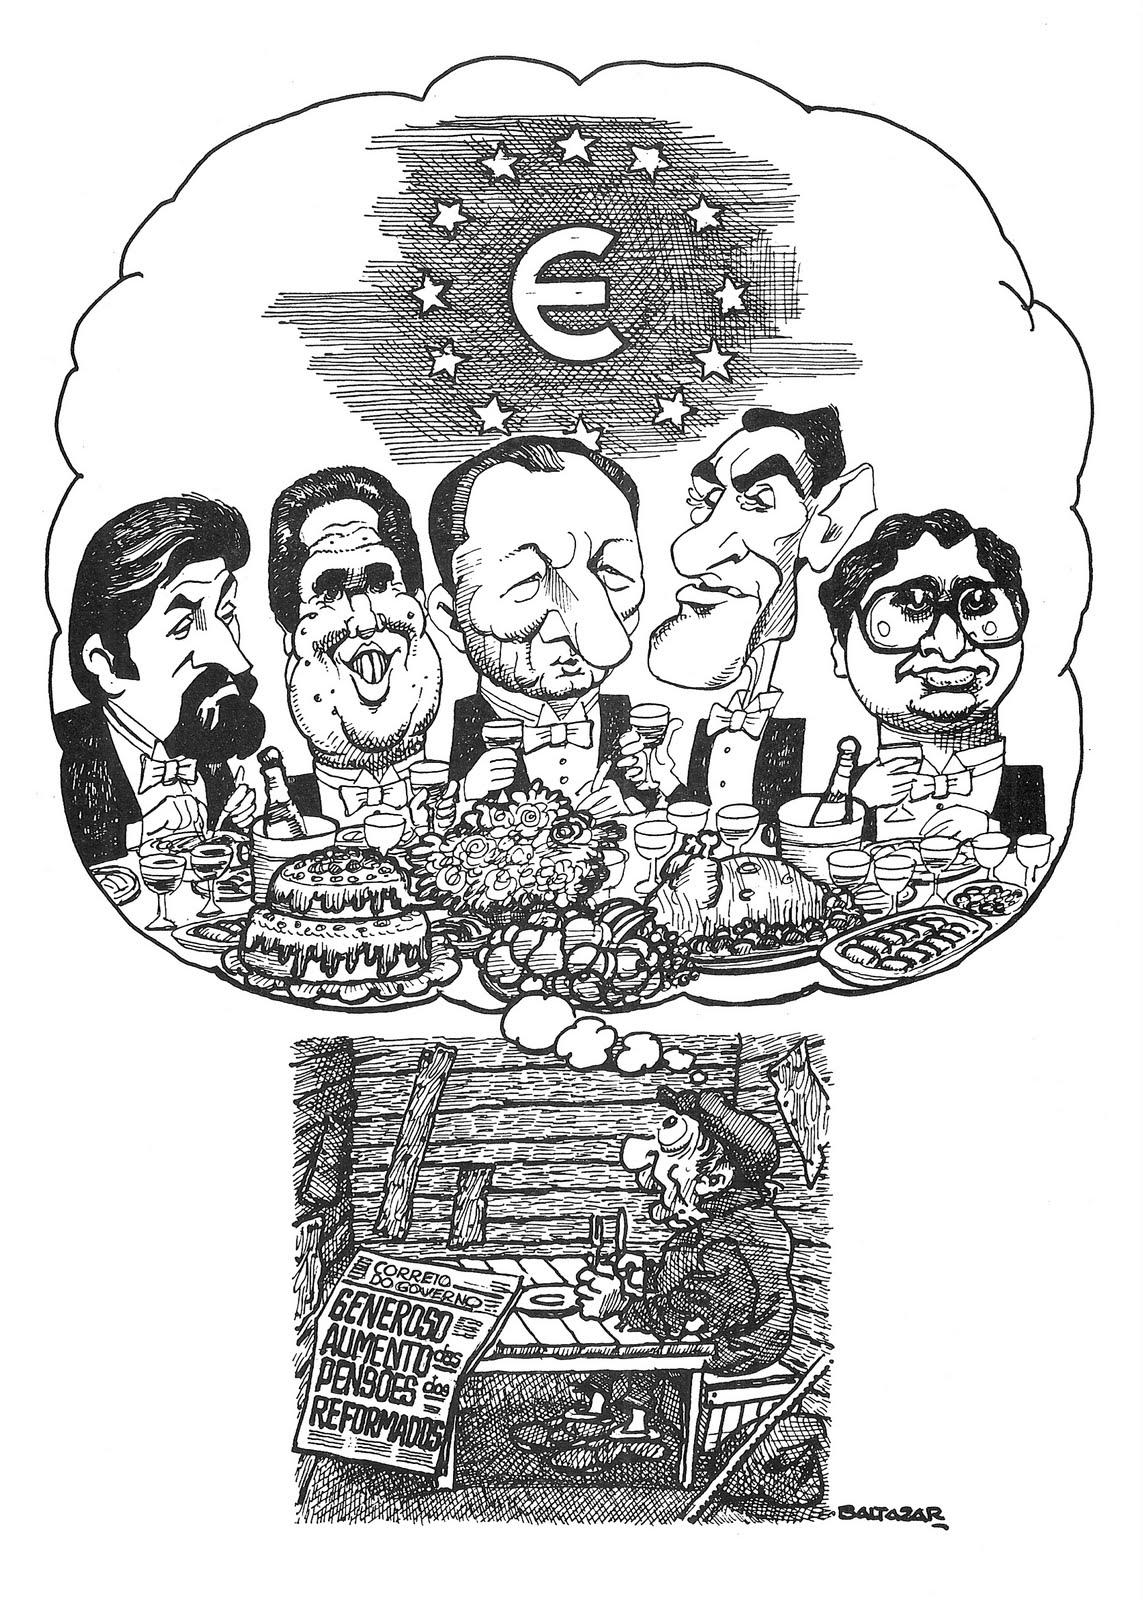 Humorgrafe O Mestre Da Caricatura Baltazar Ortega